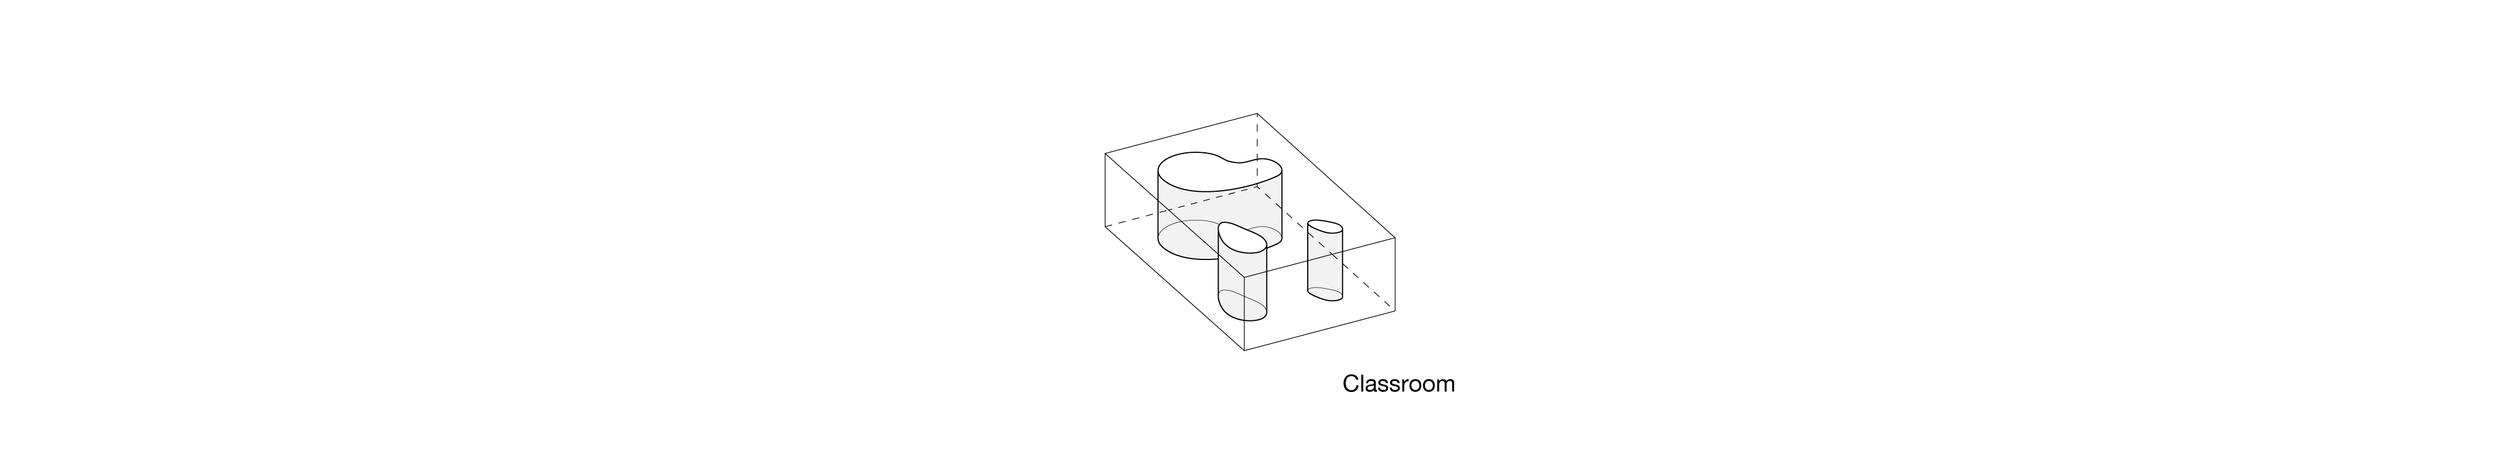 classroom diagram-01-01.jpg